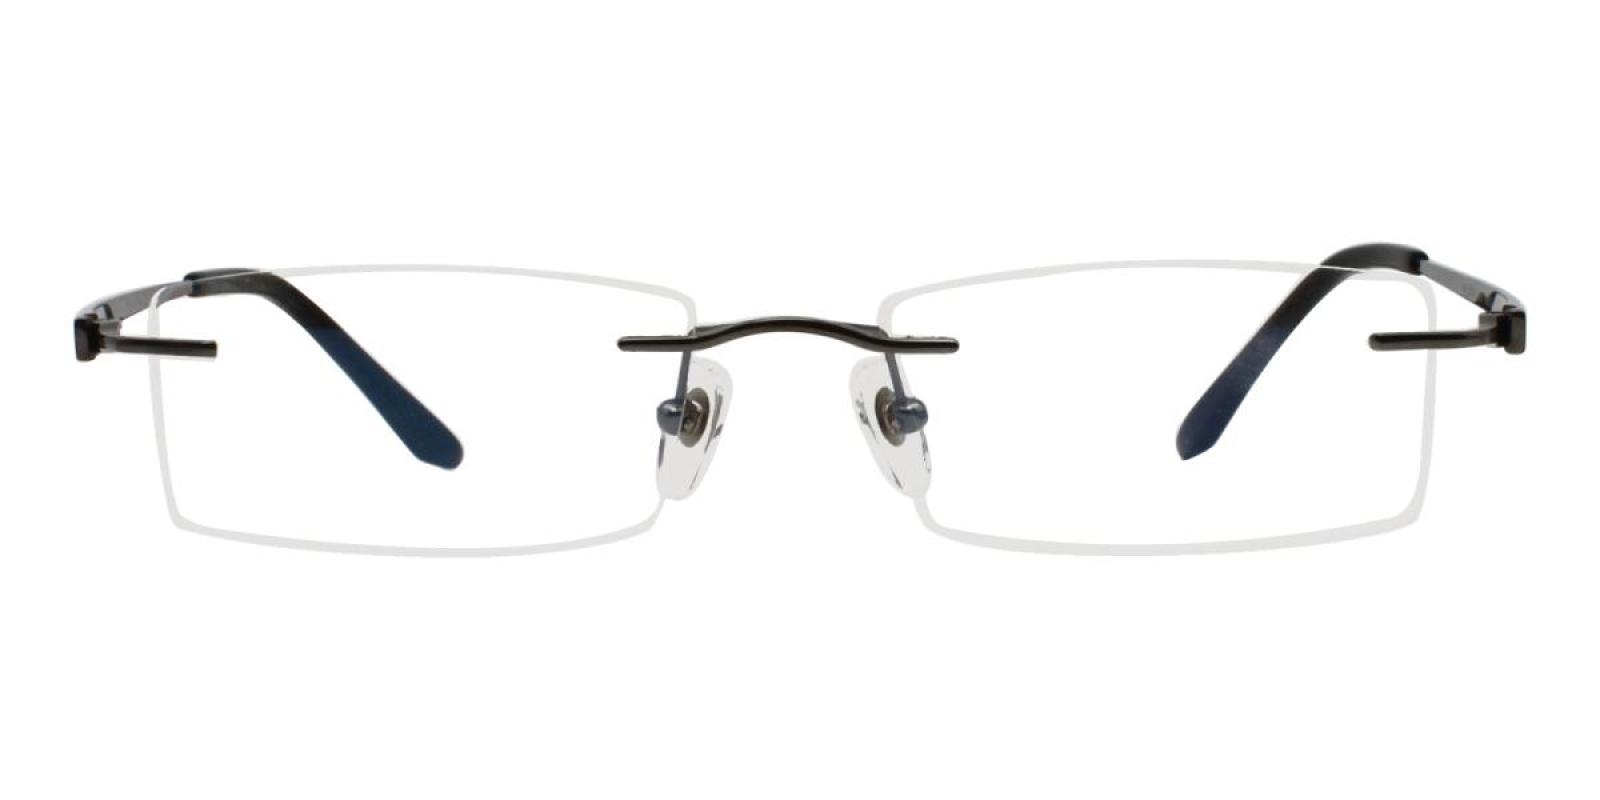 Benzalia-Gun-Varieties-Titanium-Eyeglasses-additional2